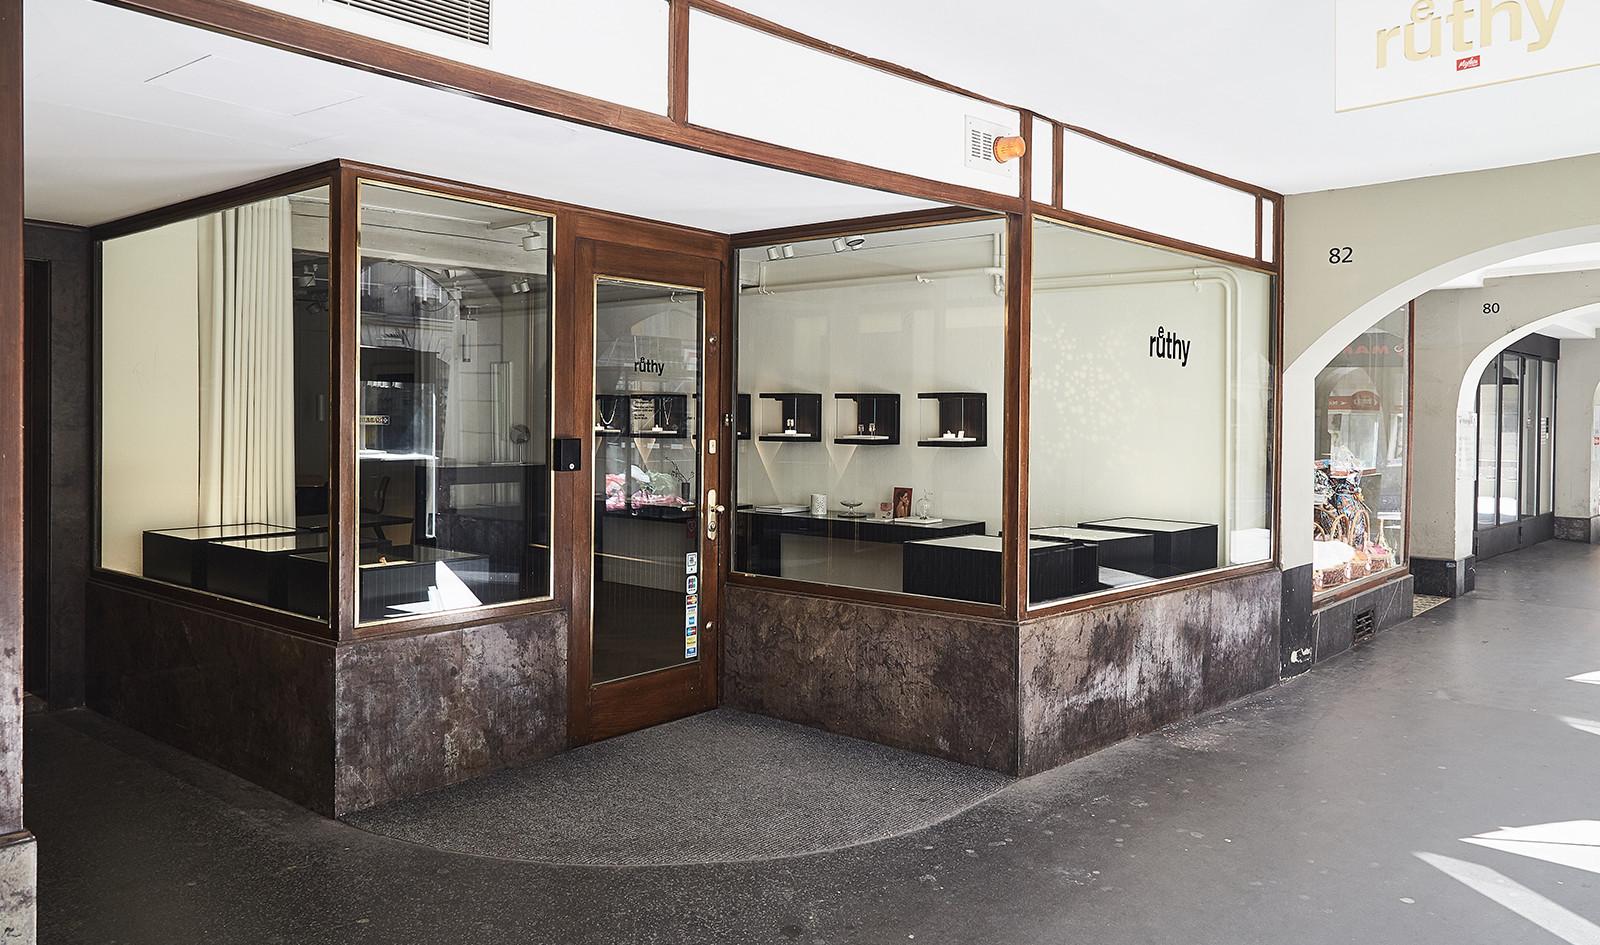 Atelier Rüthy